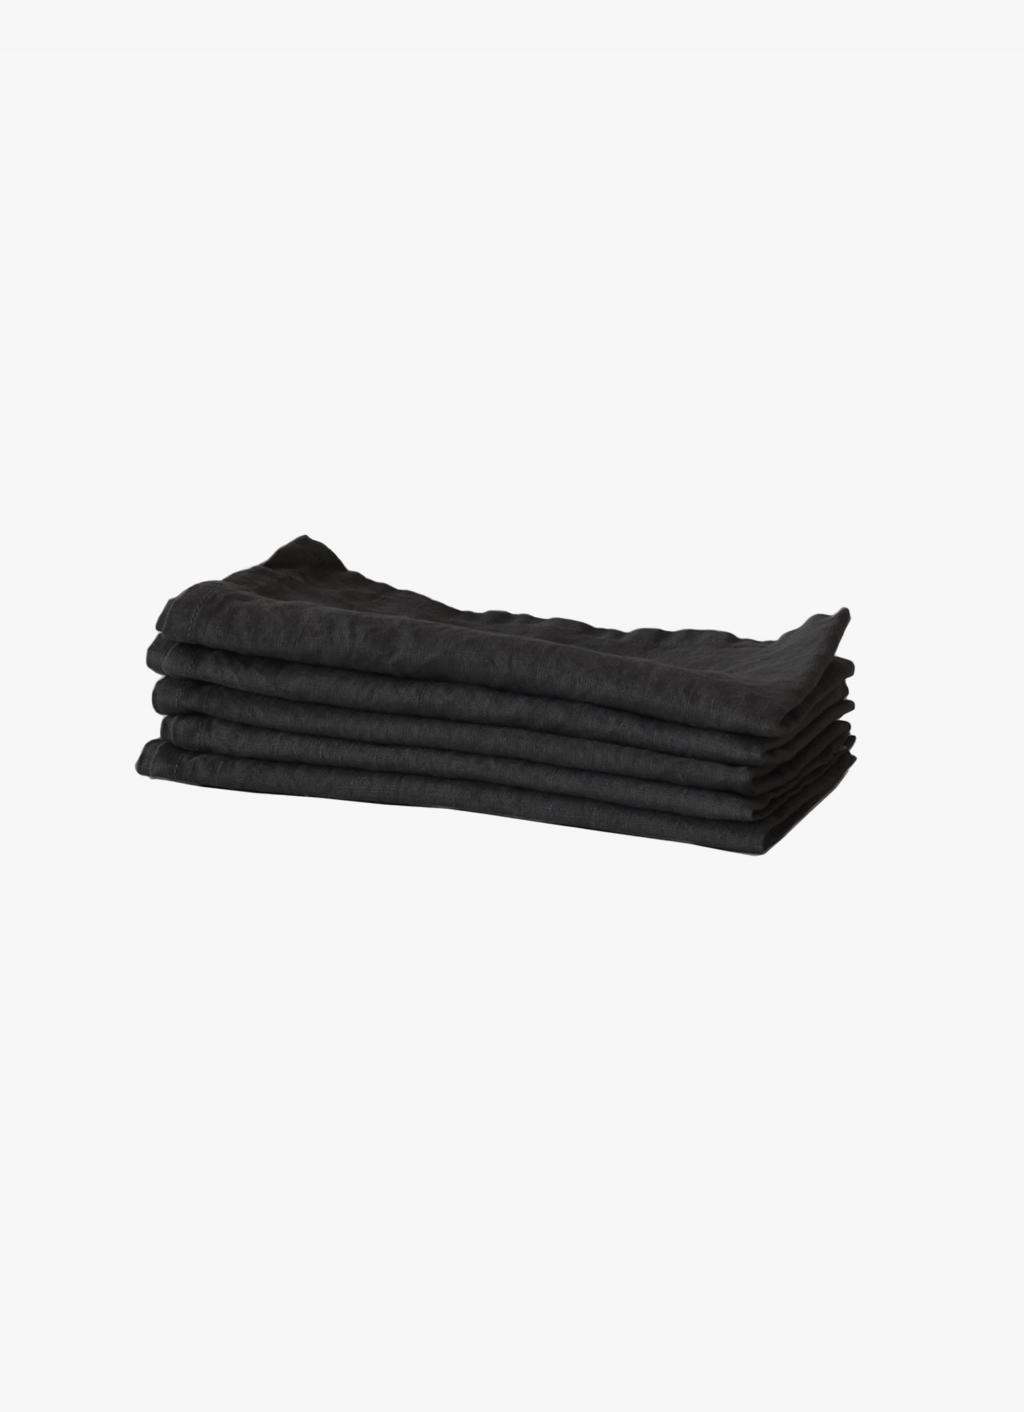 Tell Me More - Linen Napkin - Carbon